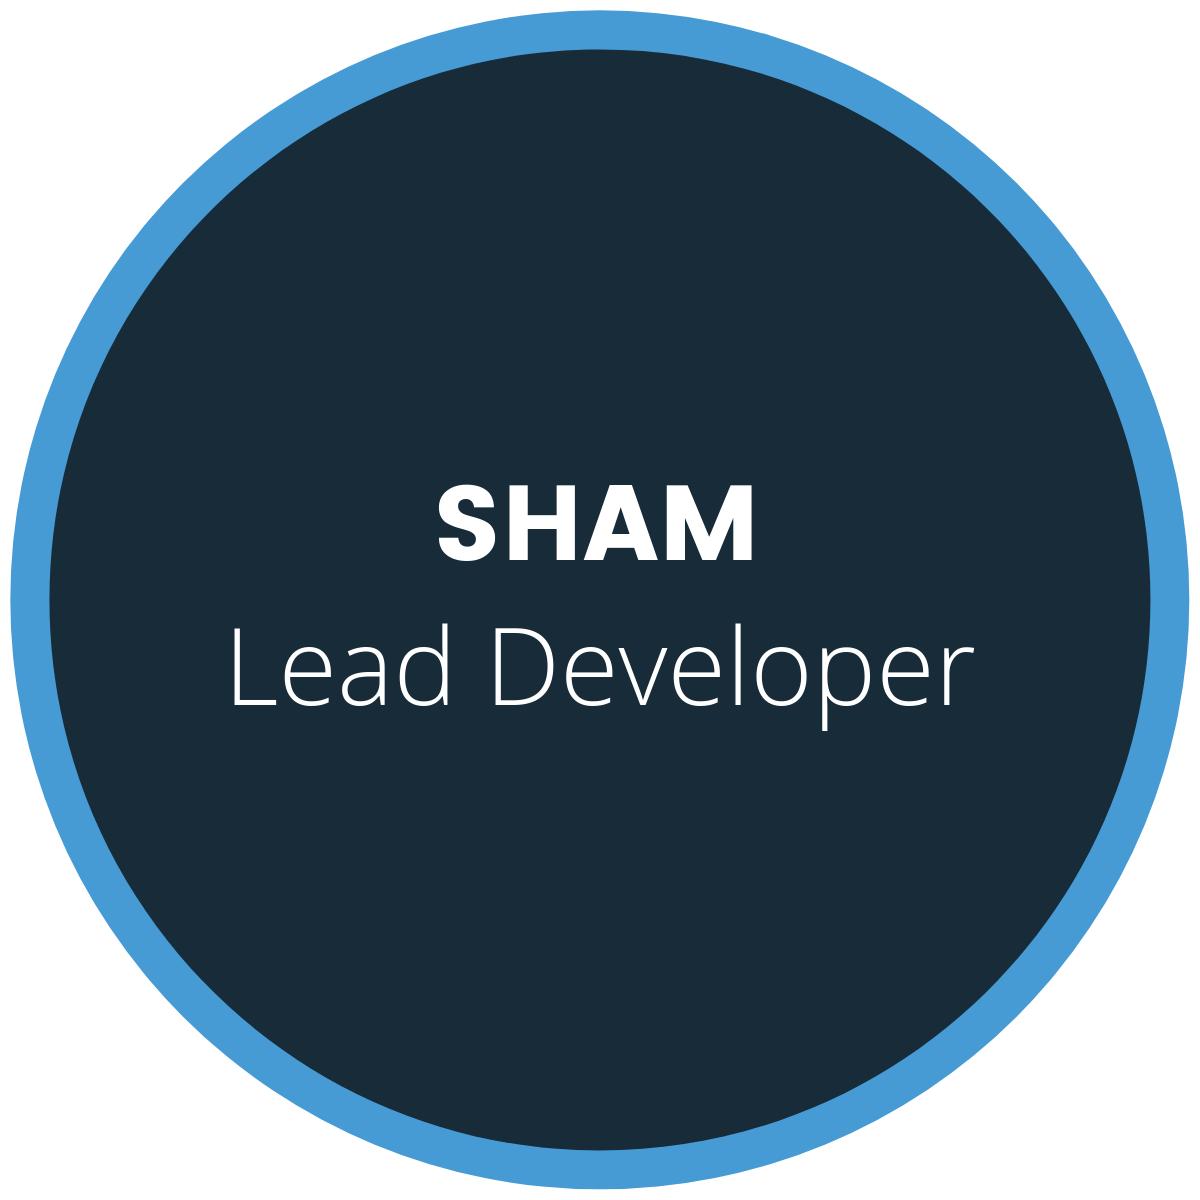 sham-web4realty